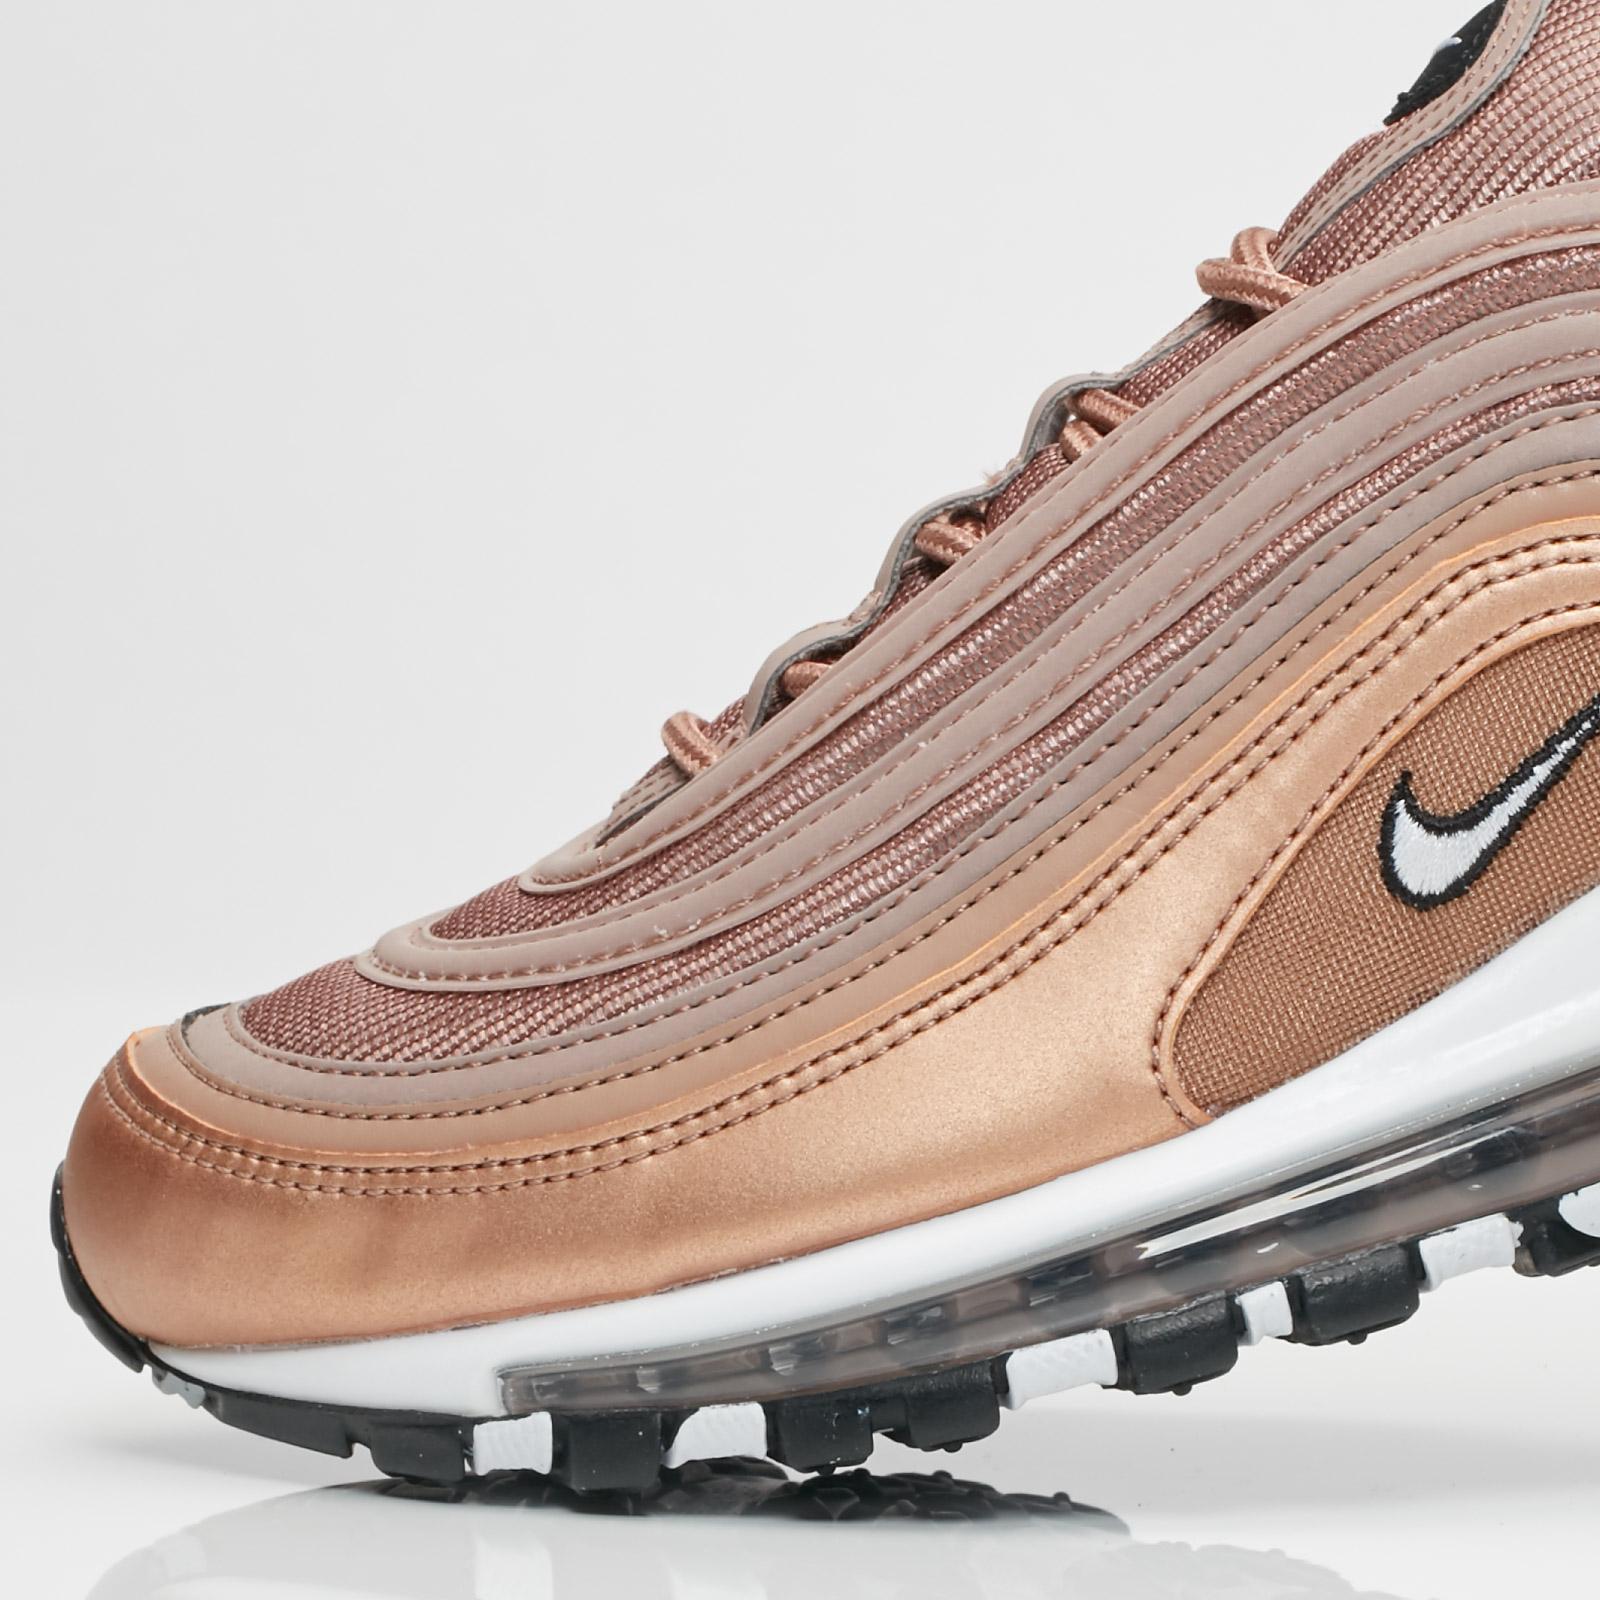 competitive price 0c315 1d09d ... Nike Sportswear Air Max 97 ...